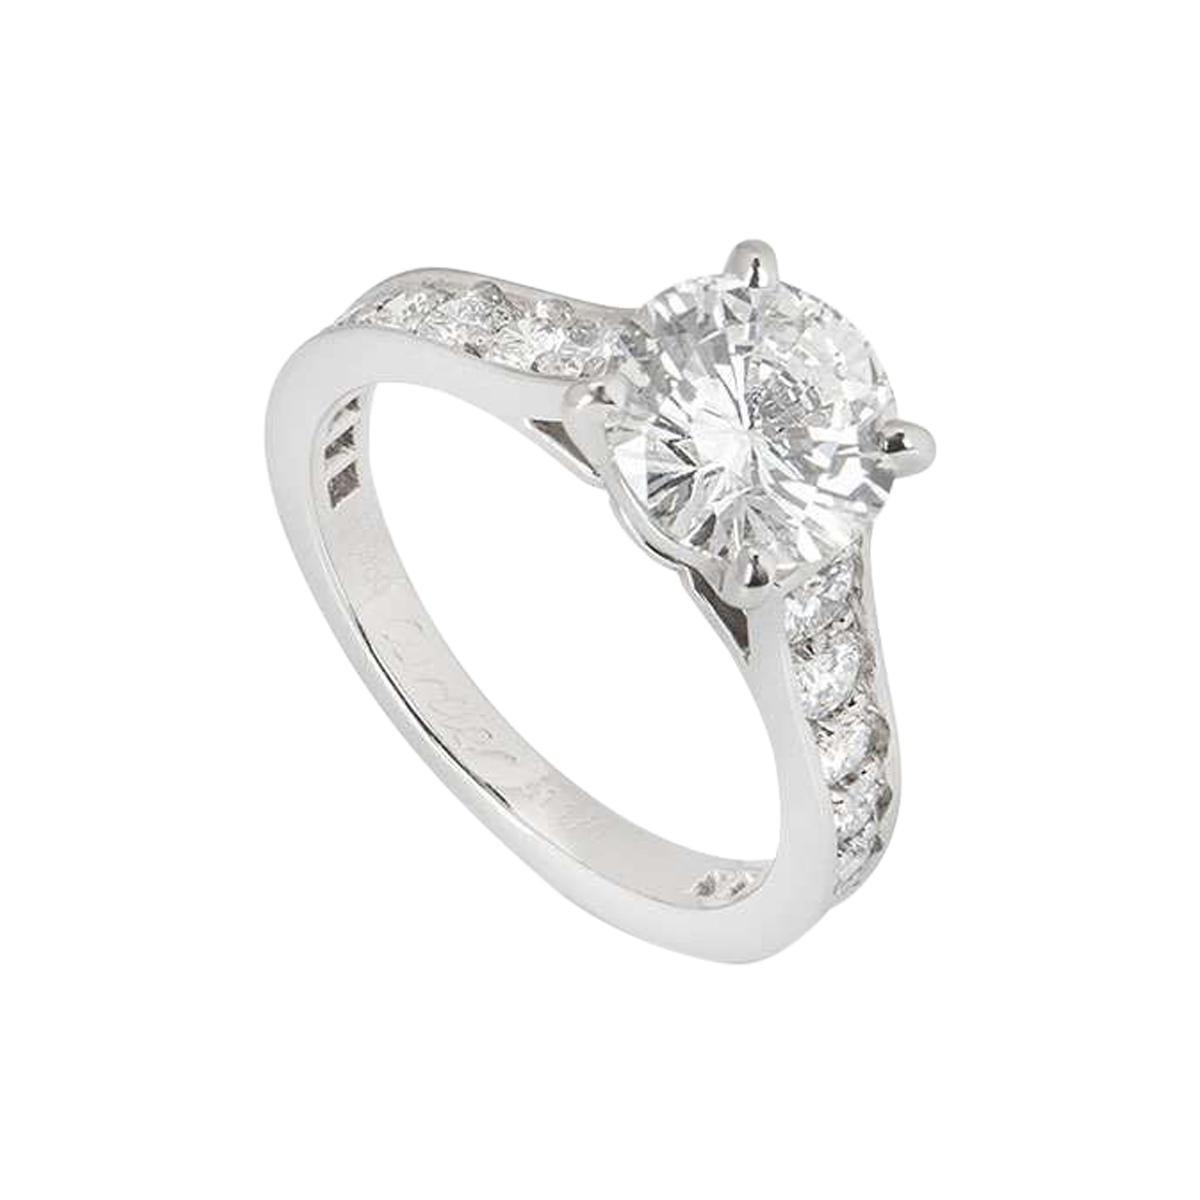 Cartier Solitaire 1895 Diamond Ring 1.70ct G/VVS1